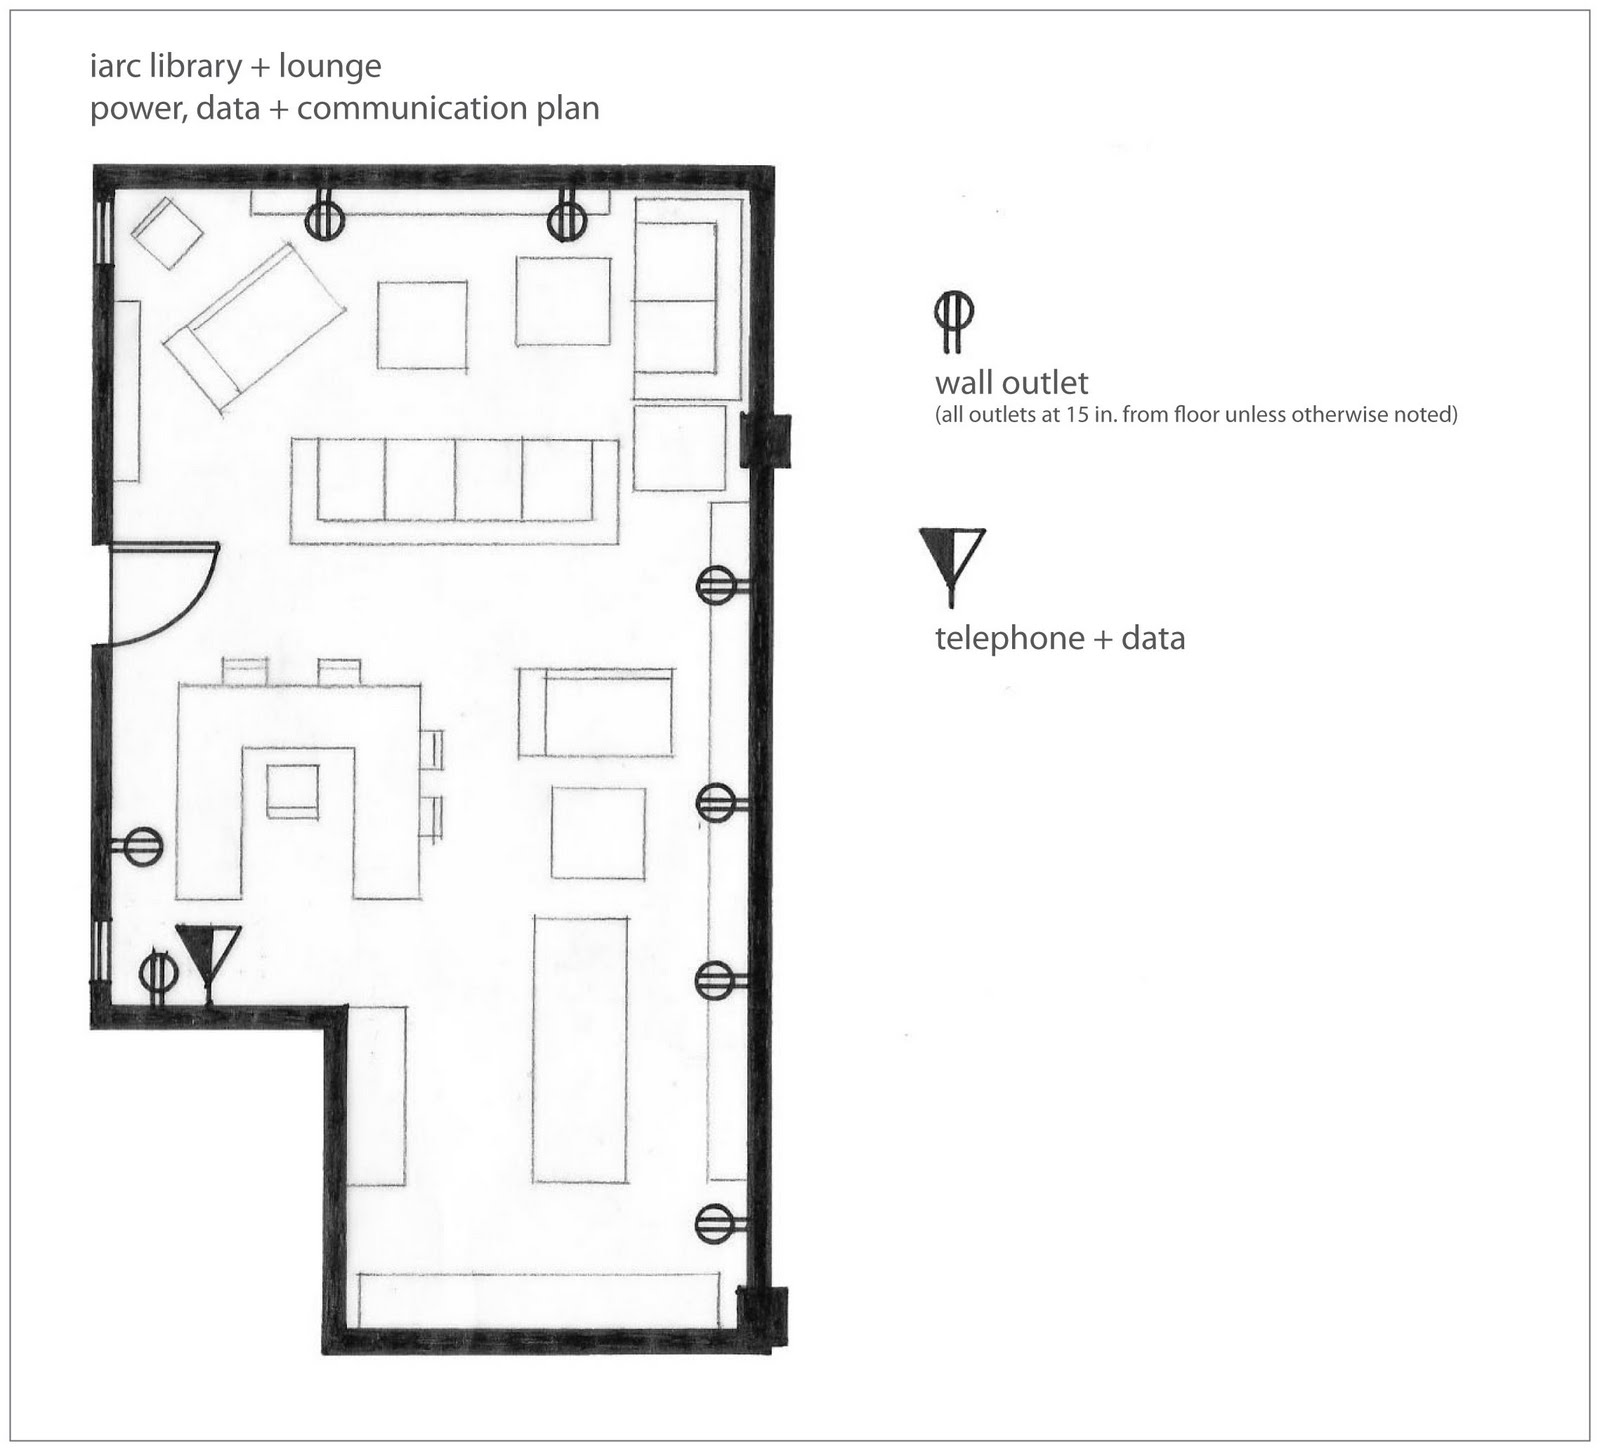 Interior Lighting Design Iarc Library Lounge Plans